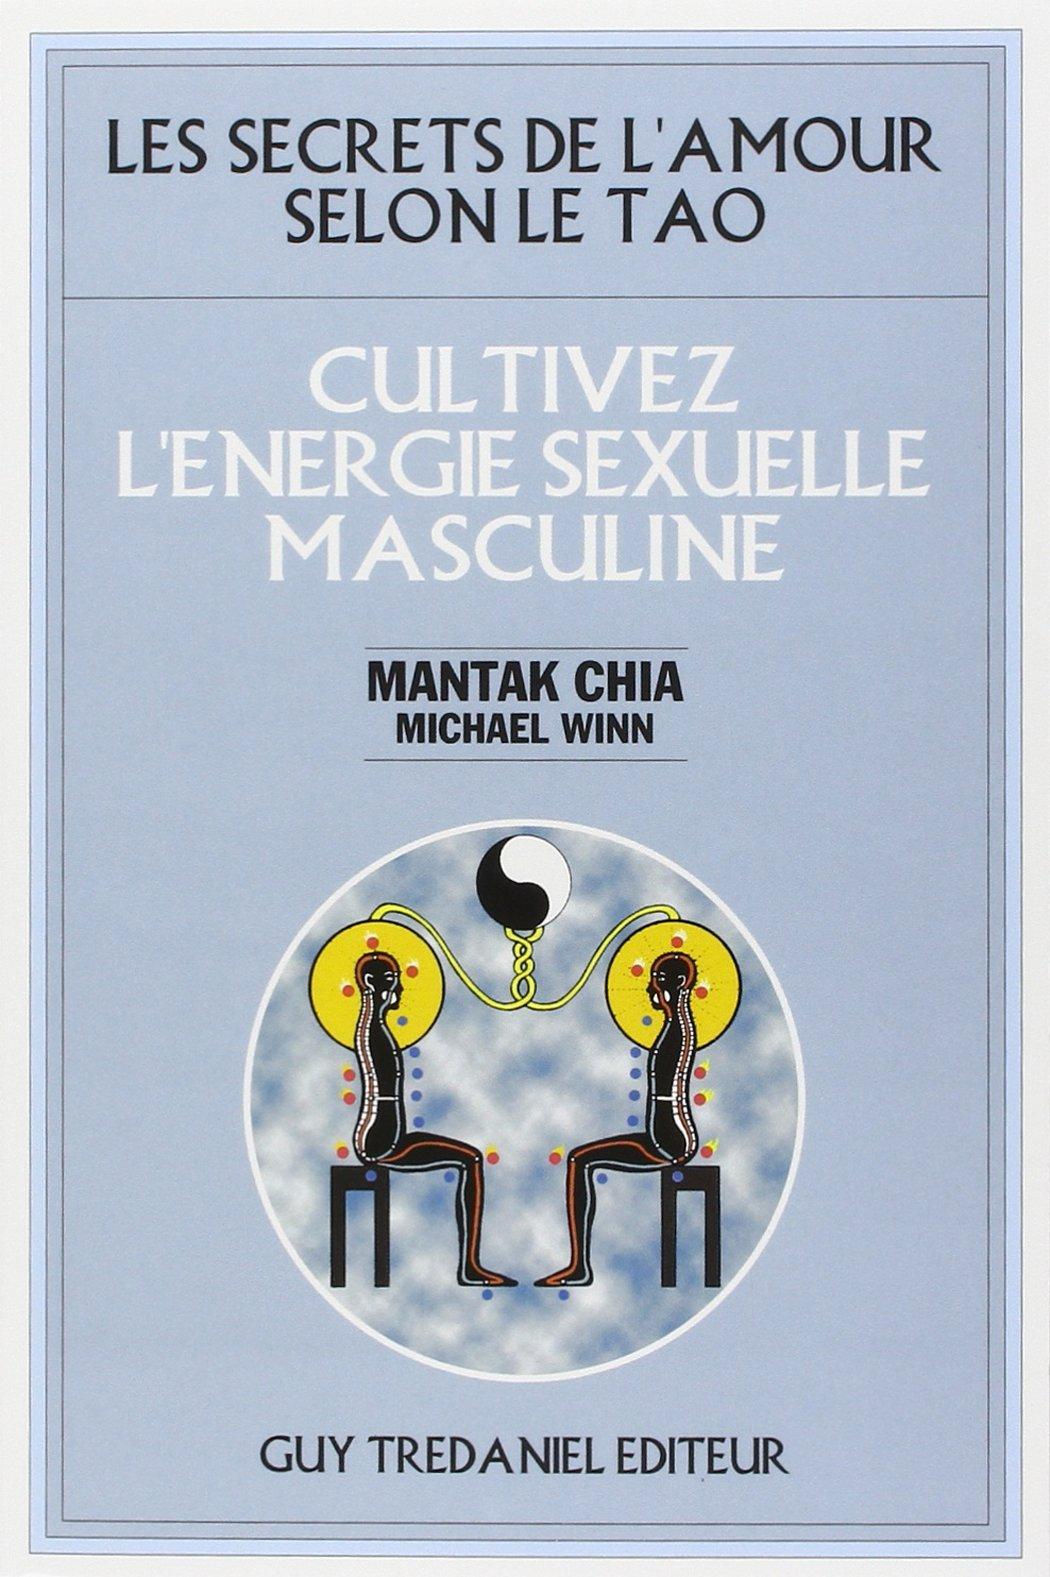 Cultivez l'énergie sexuelle masculine Poche – 14 janvier 2000 Mantak Chia Michael Winn Editeur Guy Tredaniel 2844451381